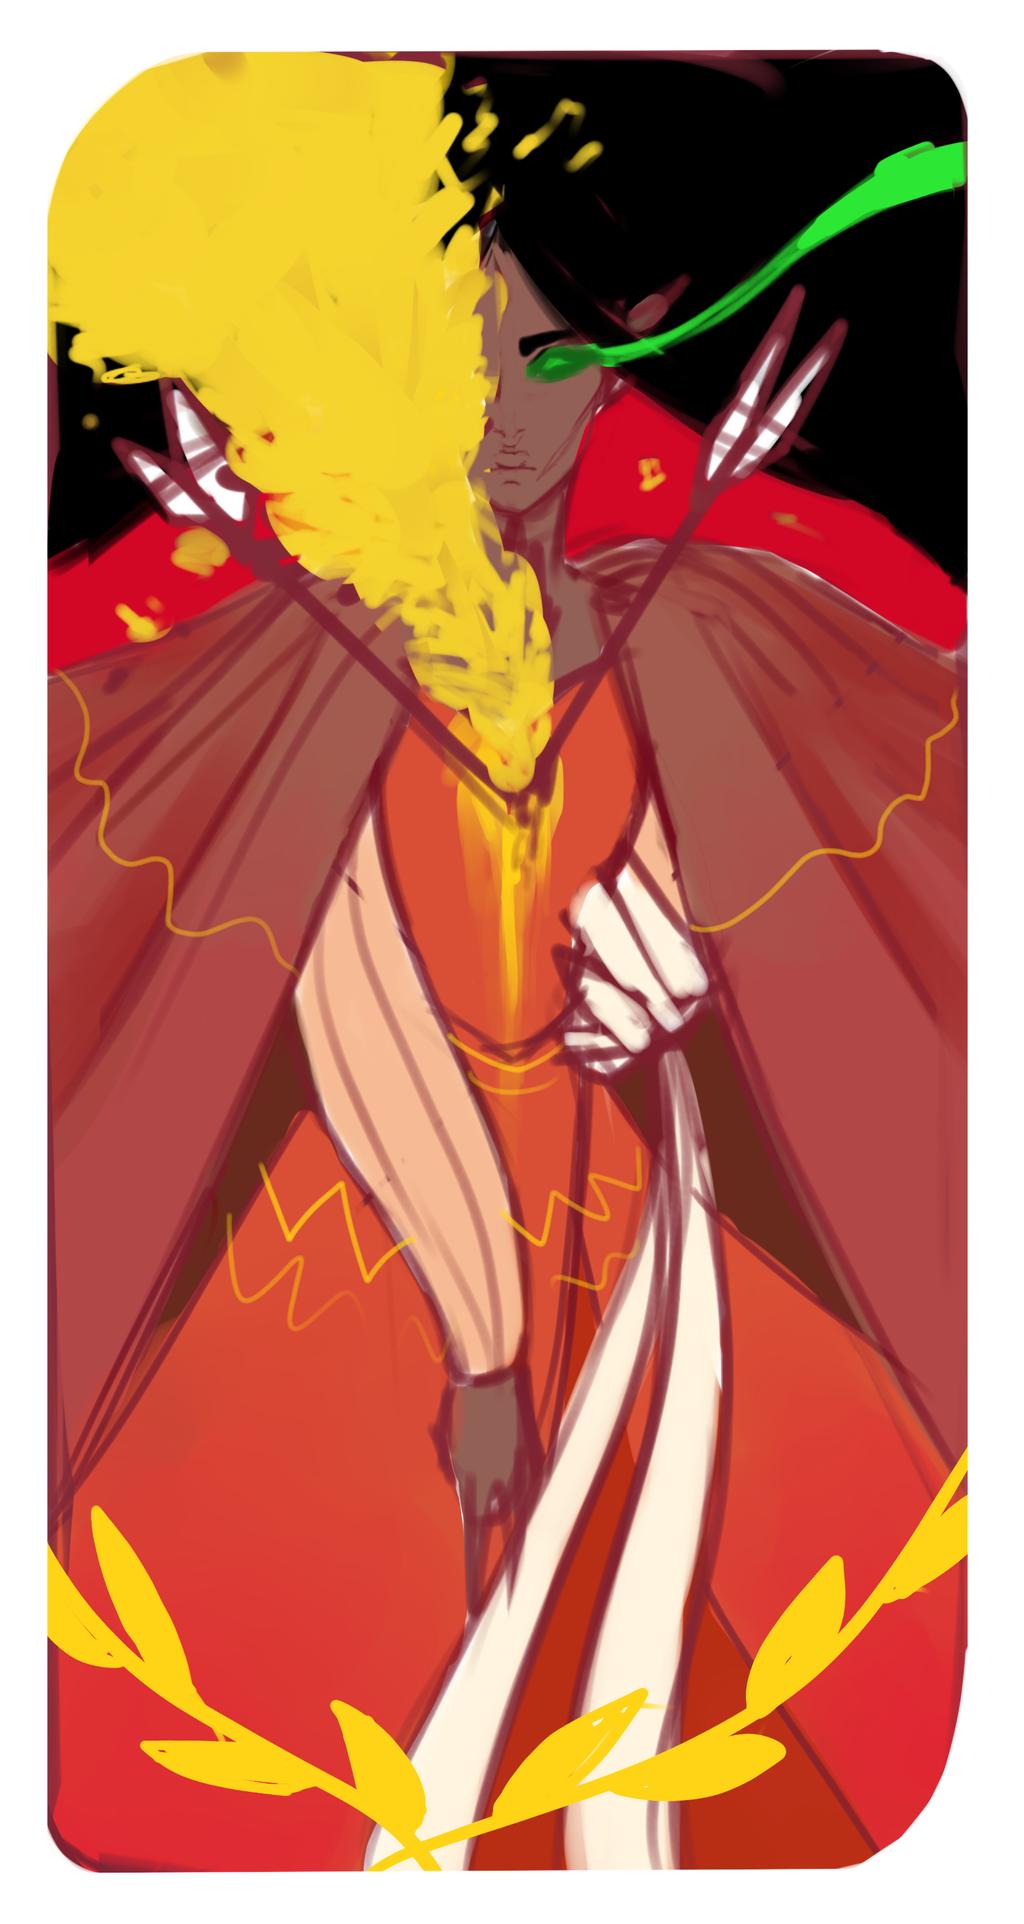 inquisitor (again?) by matrioshkka